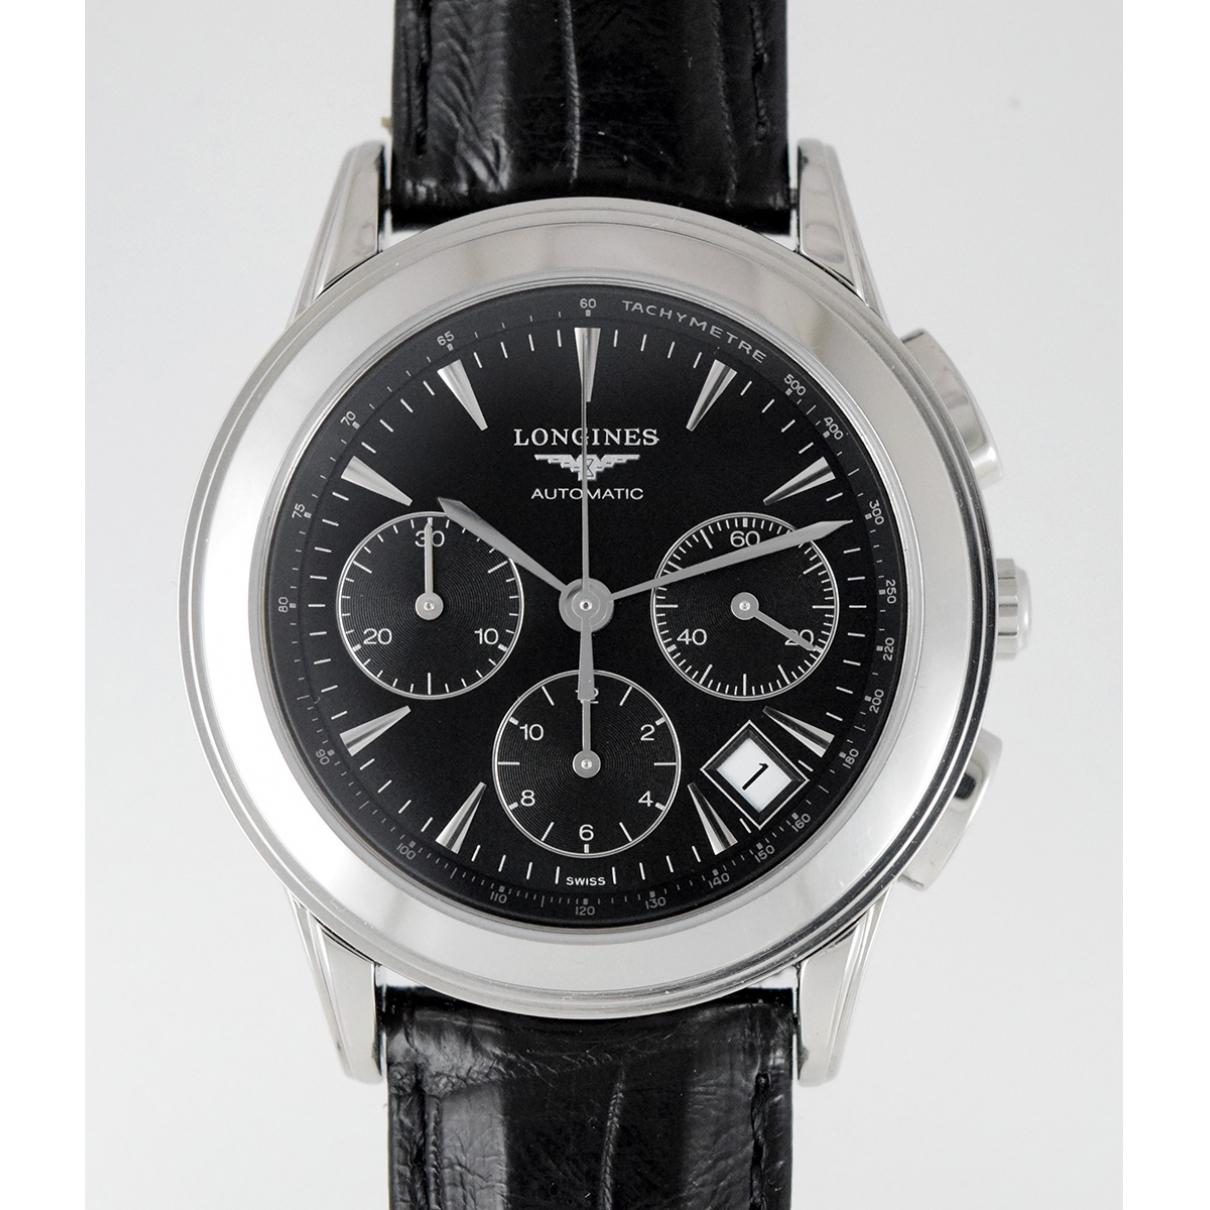 Relojes Flagship Longines